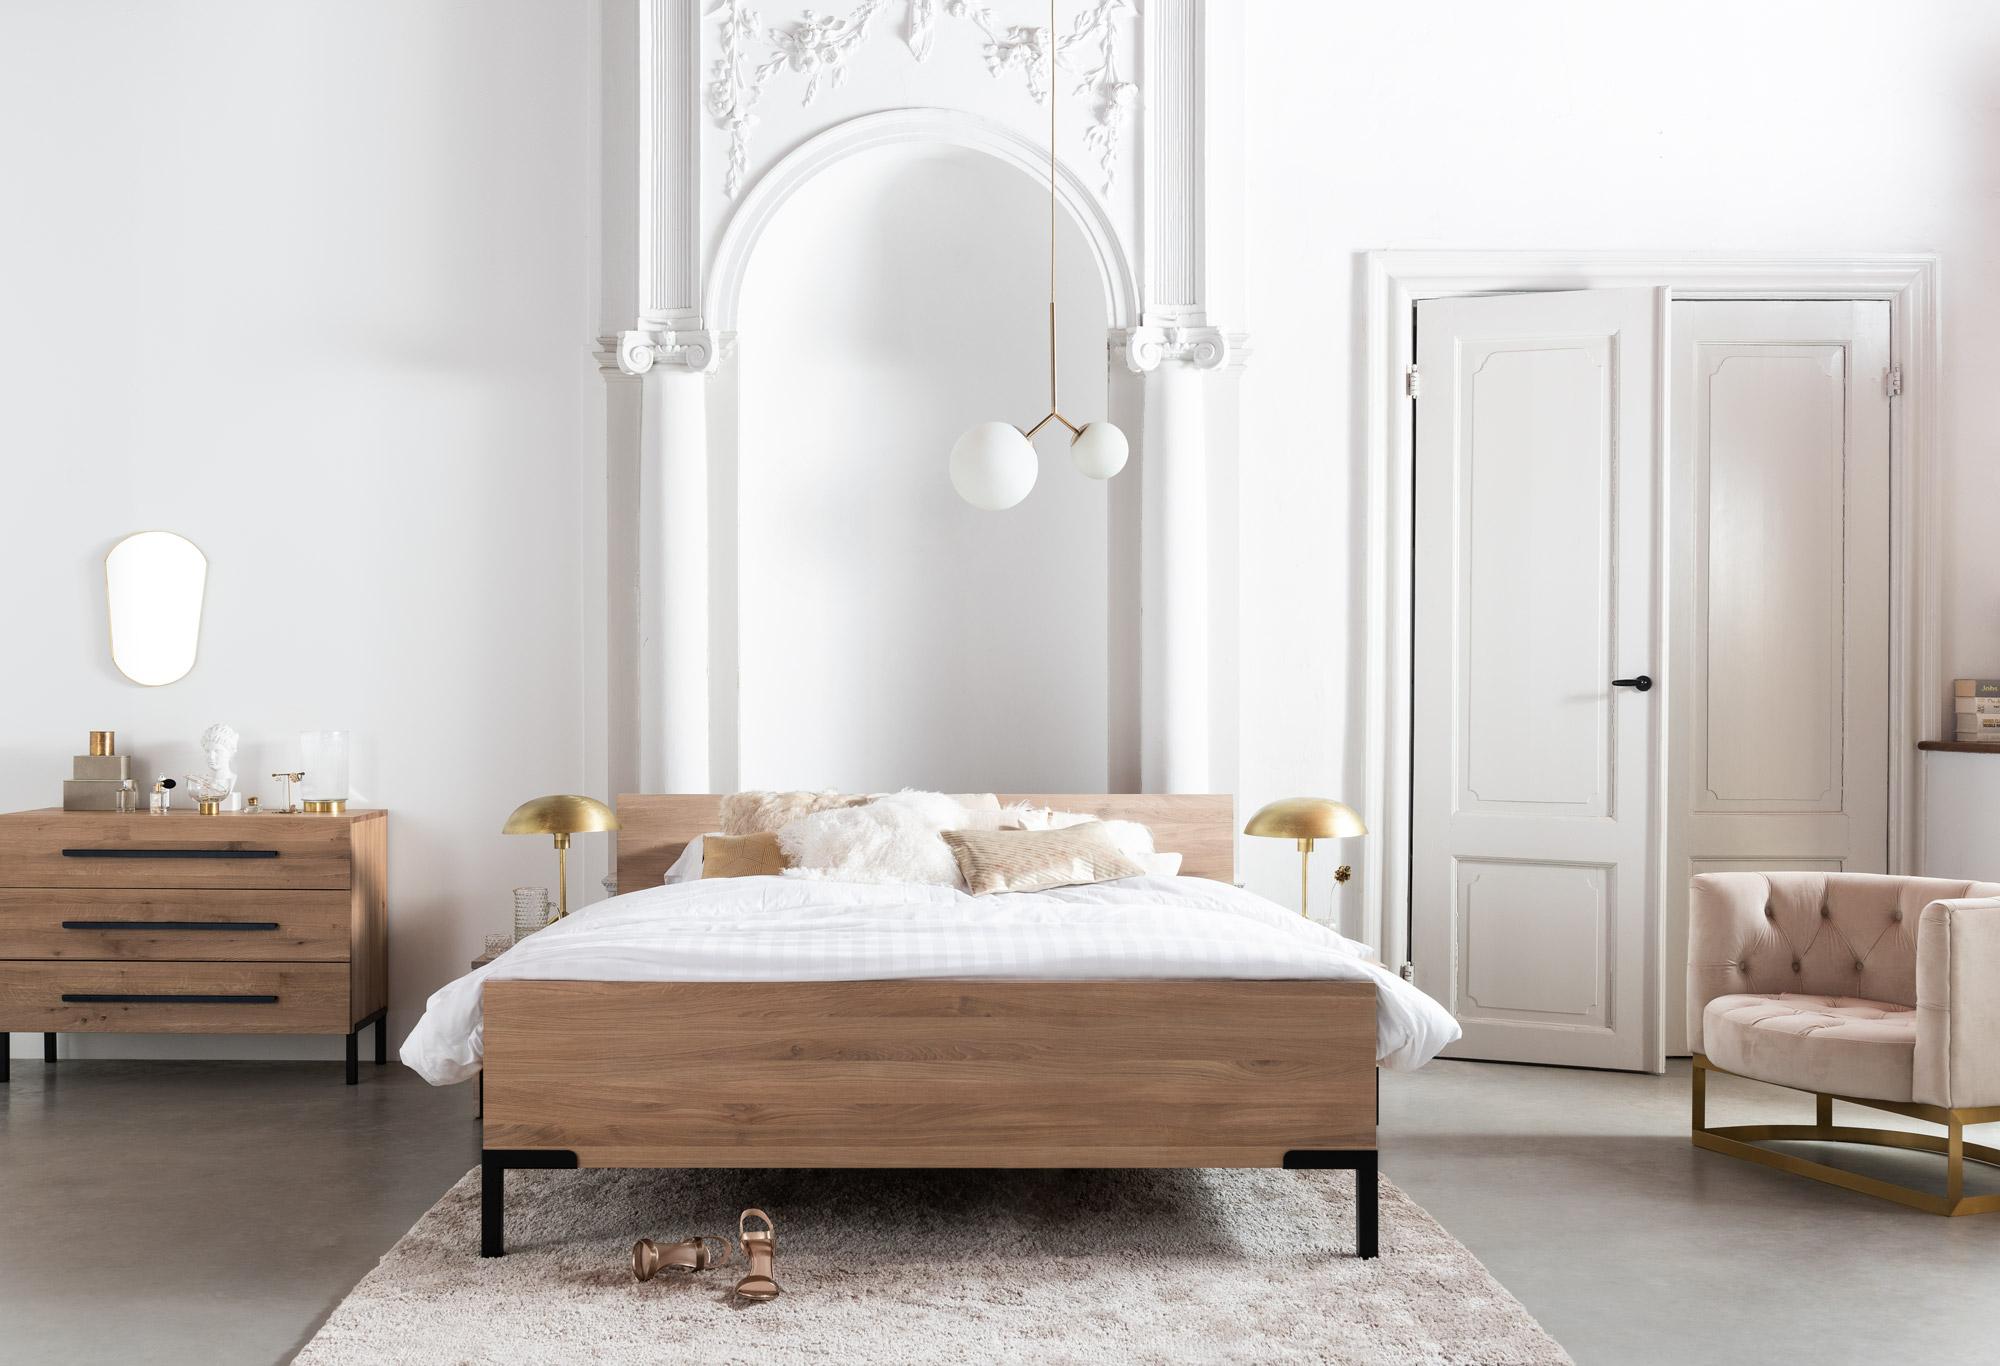 Bedframe balance Timeless   Swiss Sense